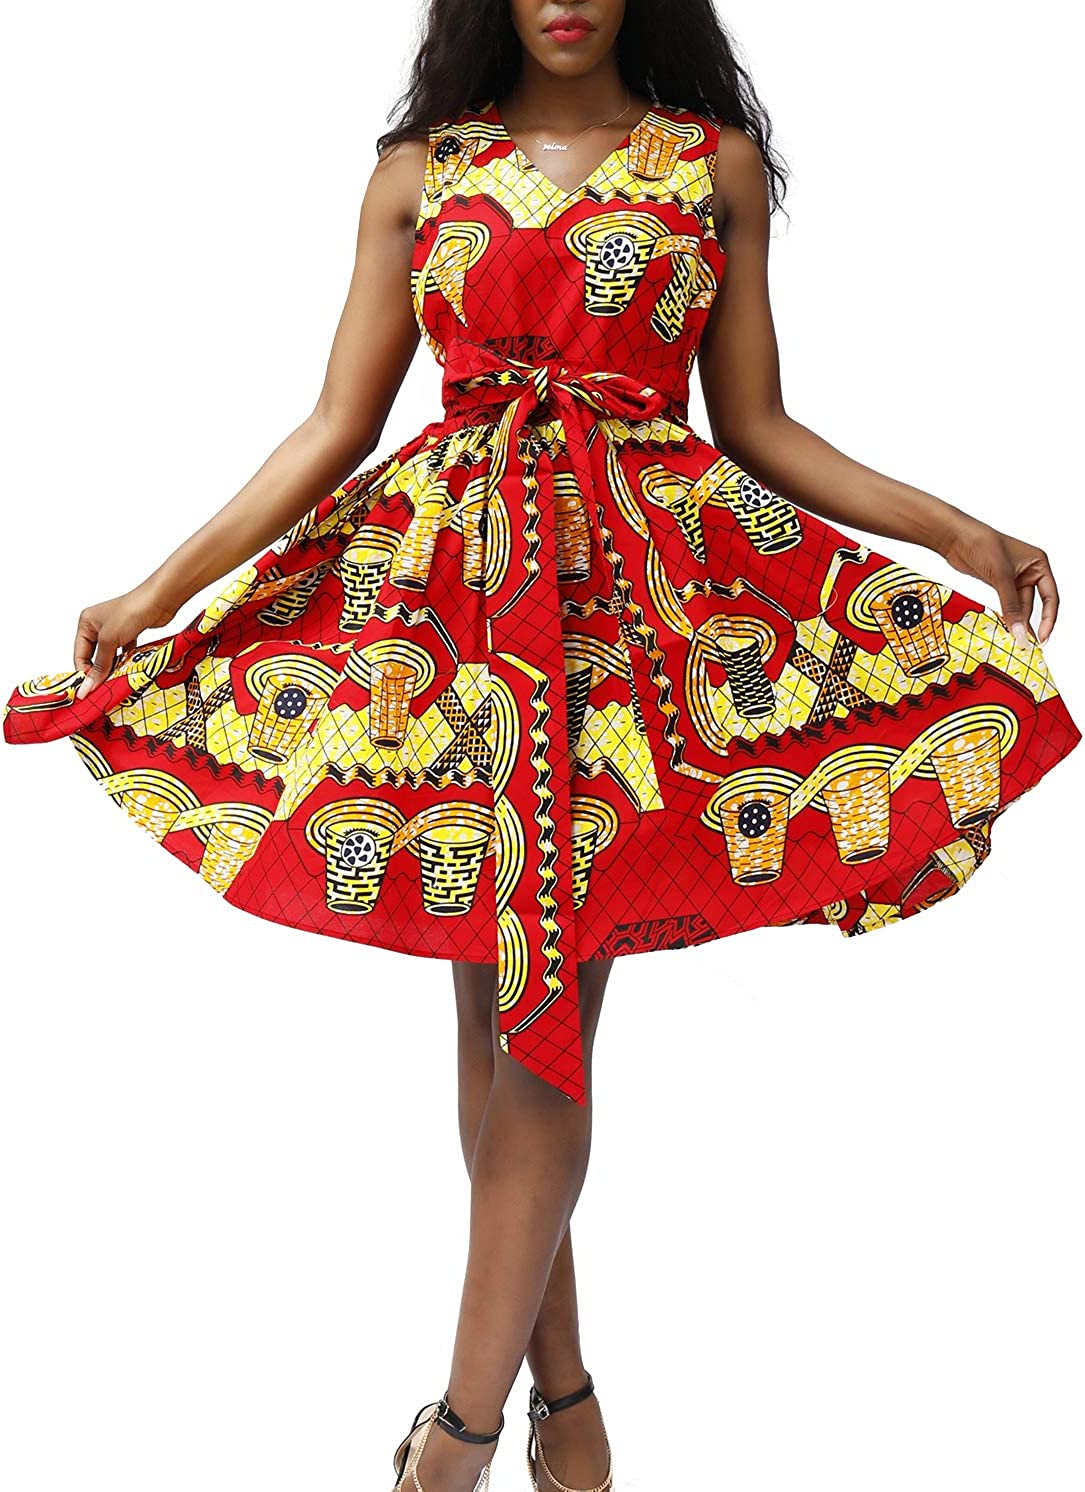 Ankara DRessAfrican Print DressDashiki Dress